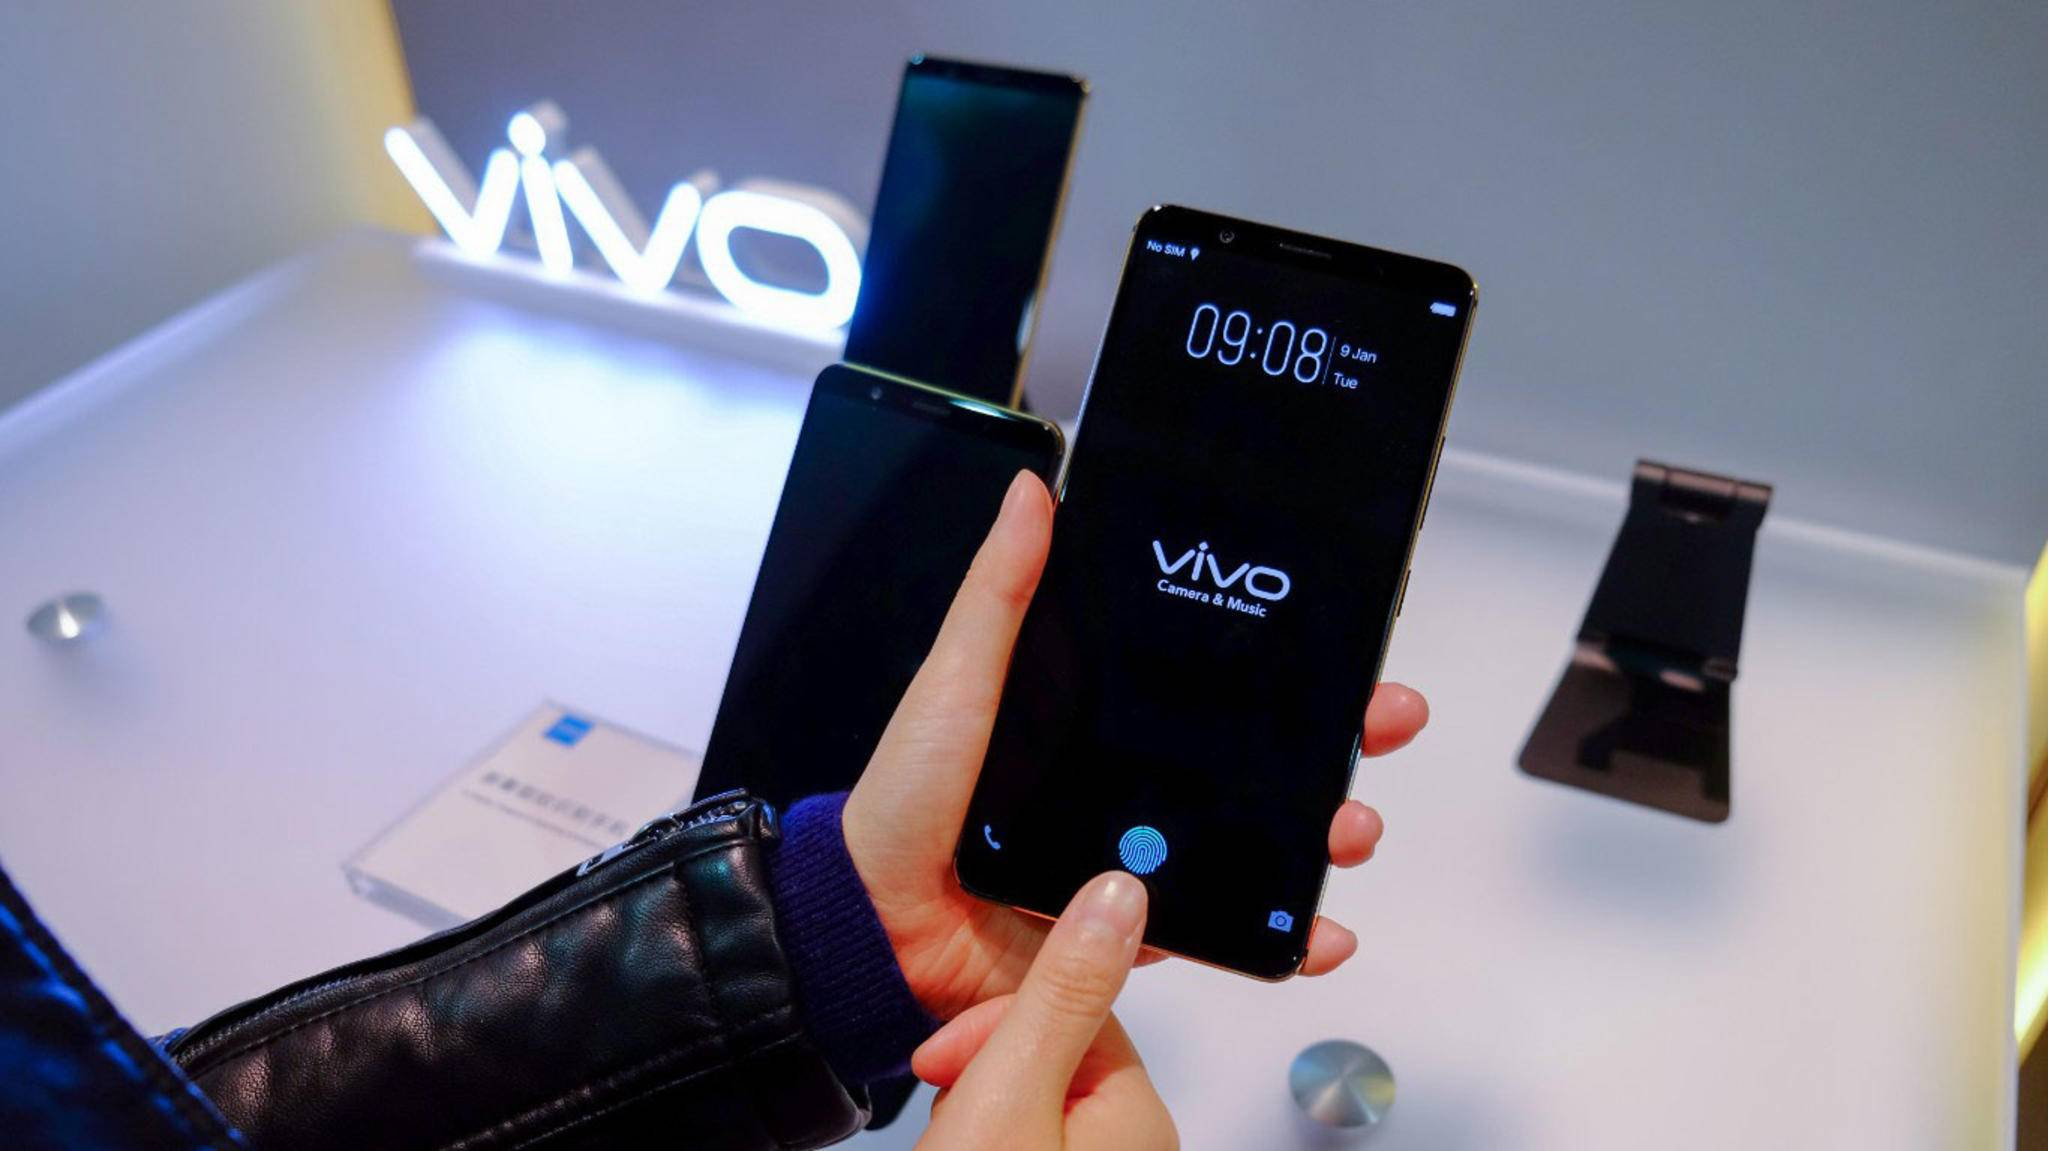 Am 12. Juni steht der Produkt-Launch des neuen Vivo-Smartphones an.